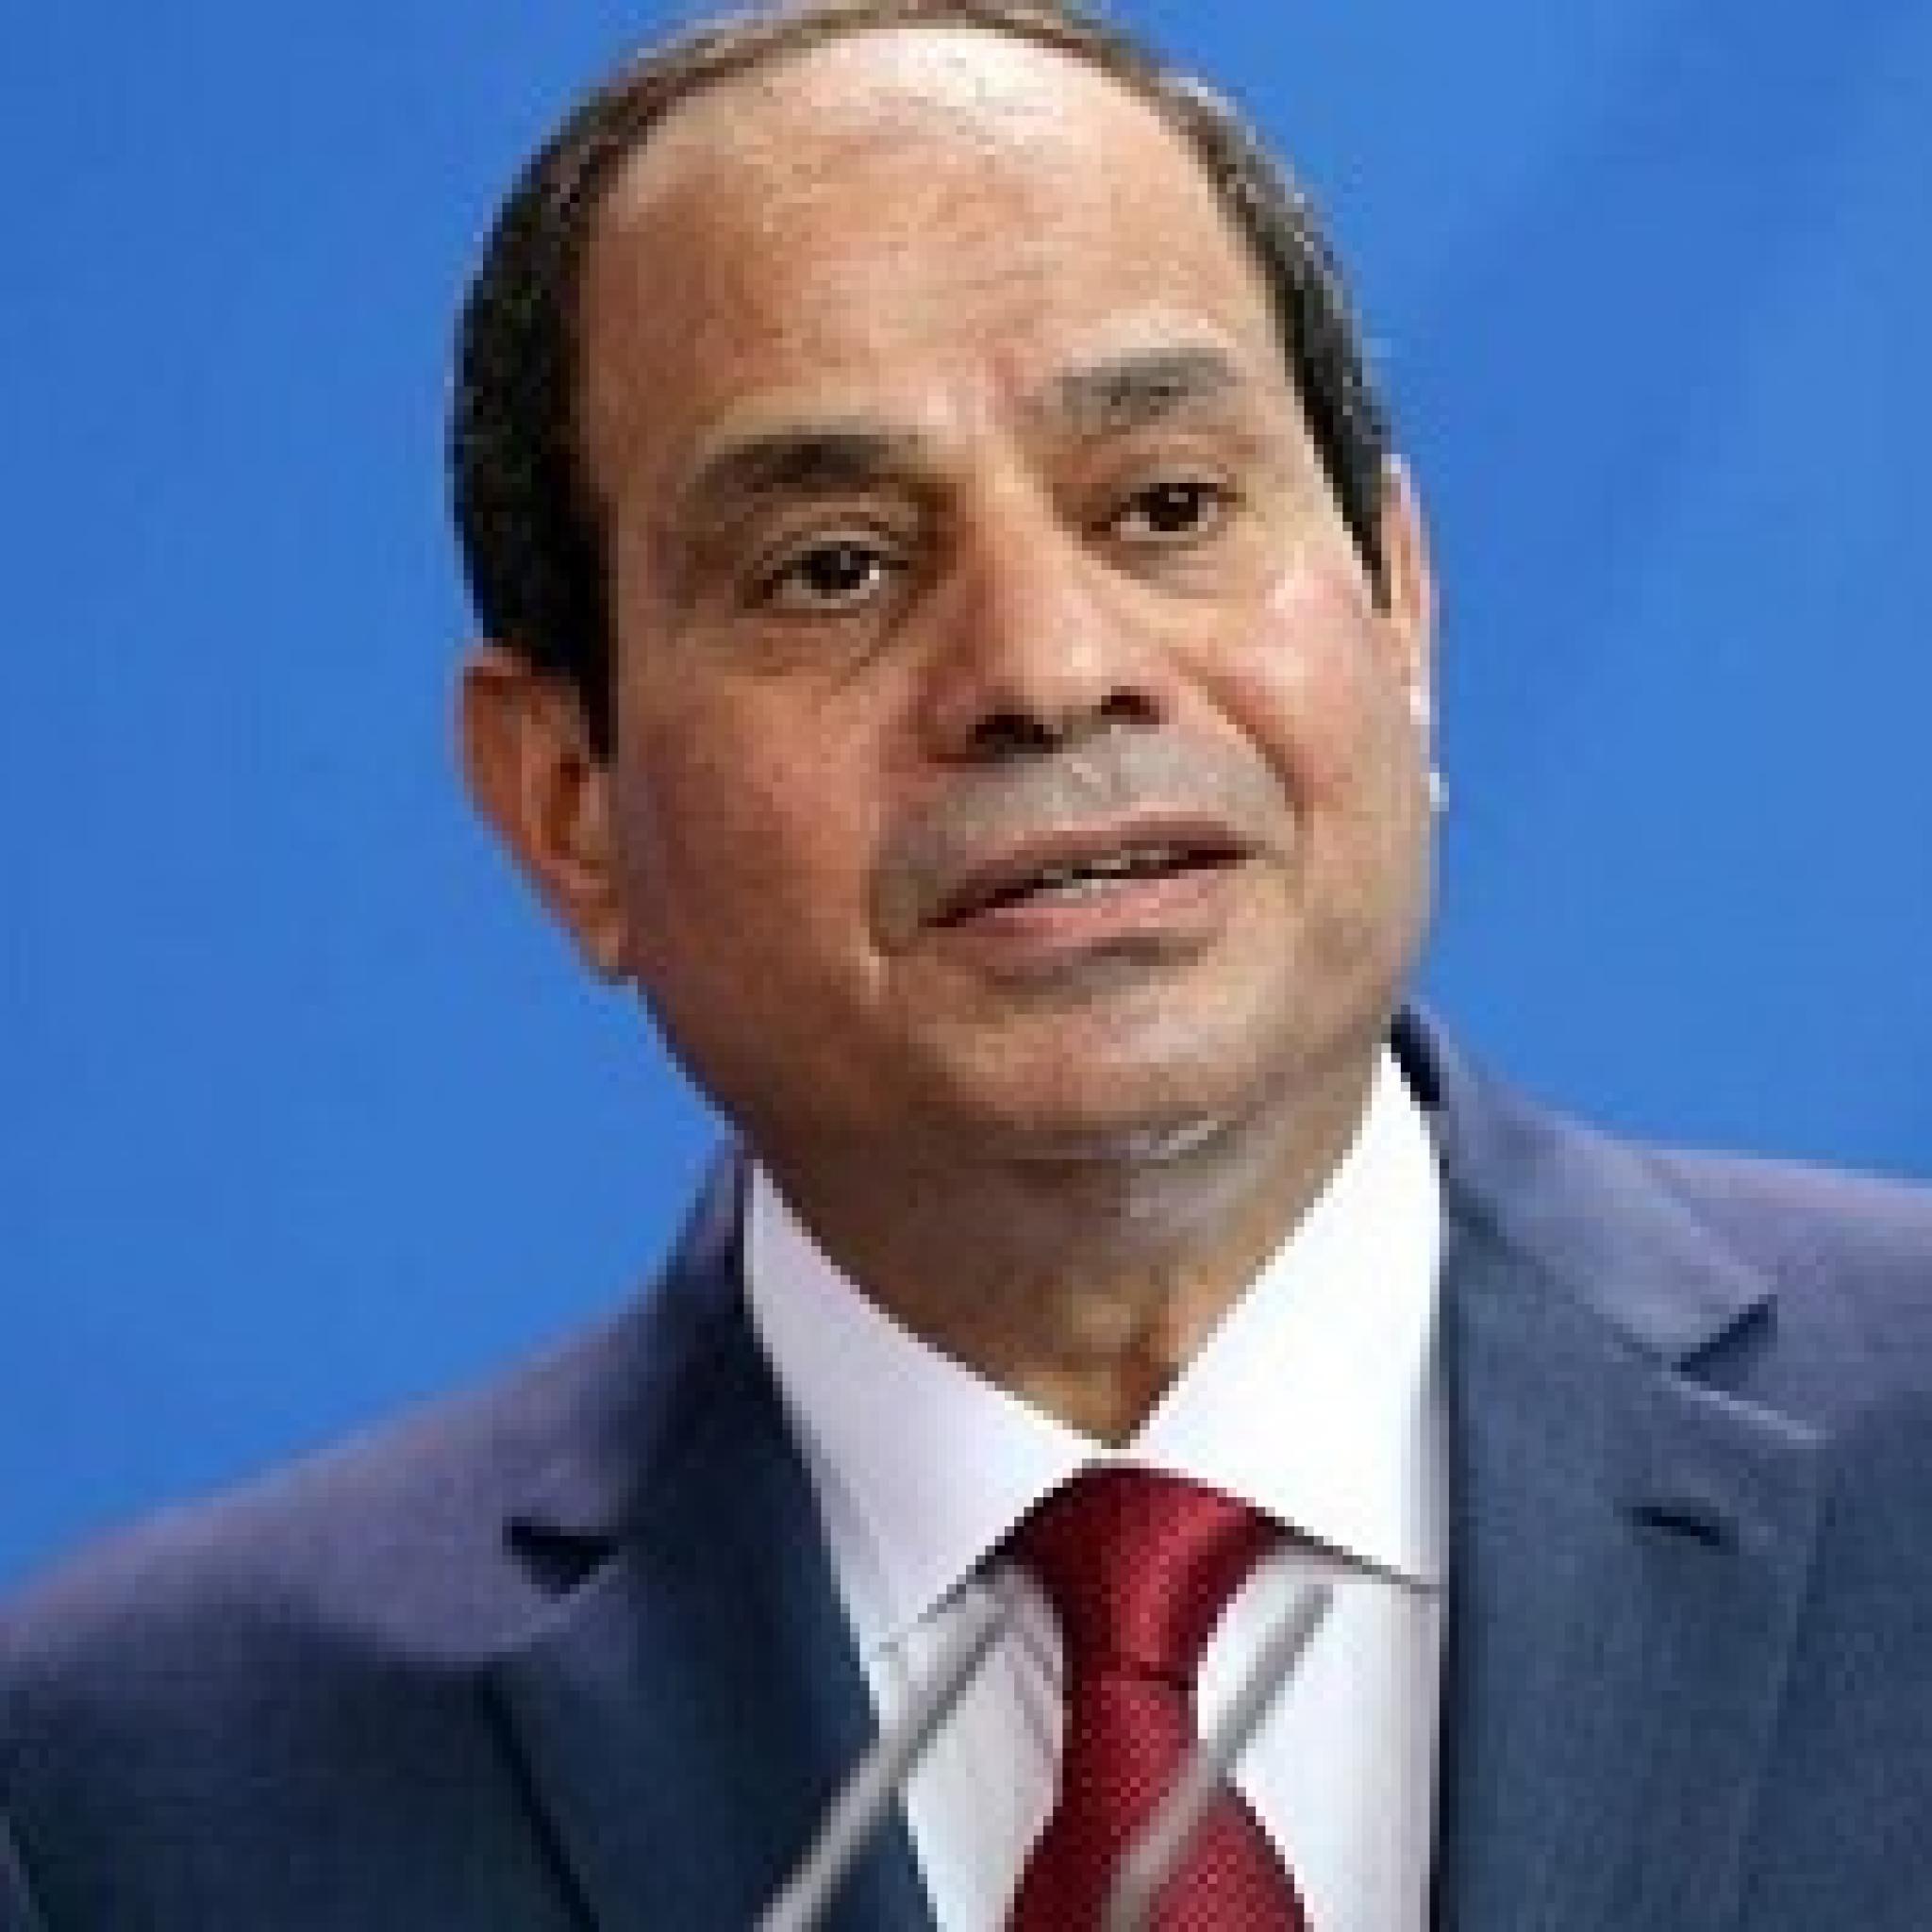 NEWS: አብዱል ፈታህ አል ሲሲ ግብፅ በአባይ ላይ ያላትን ጥቅም ለማስጠበቅ ቃል ገቡ - Abdul Fattah al-Sisi Promissed to Protect Egypt's Interests in The Nile